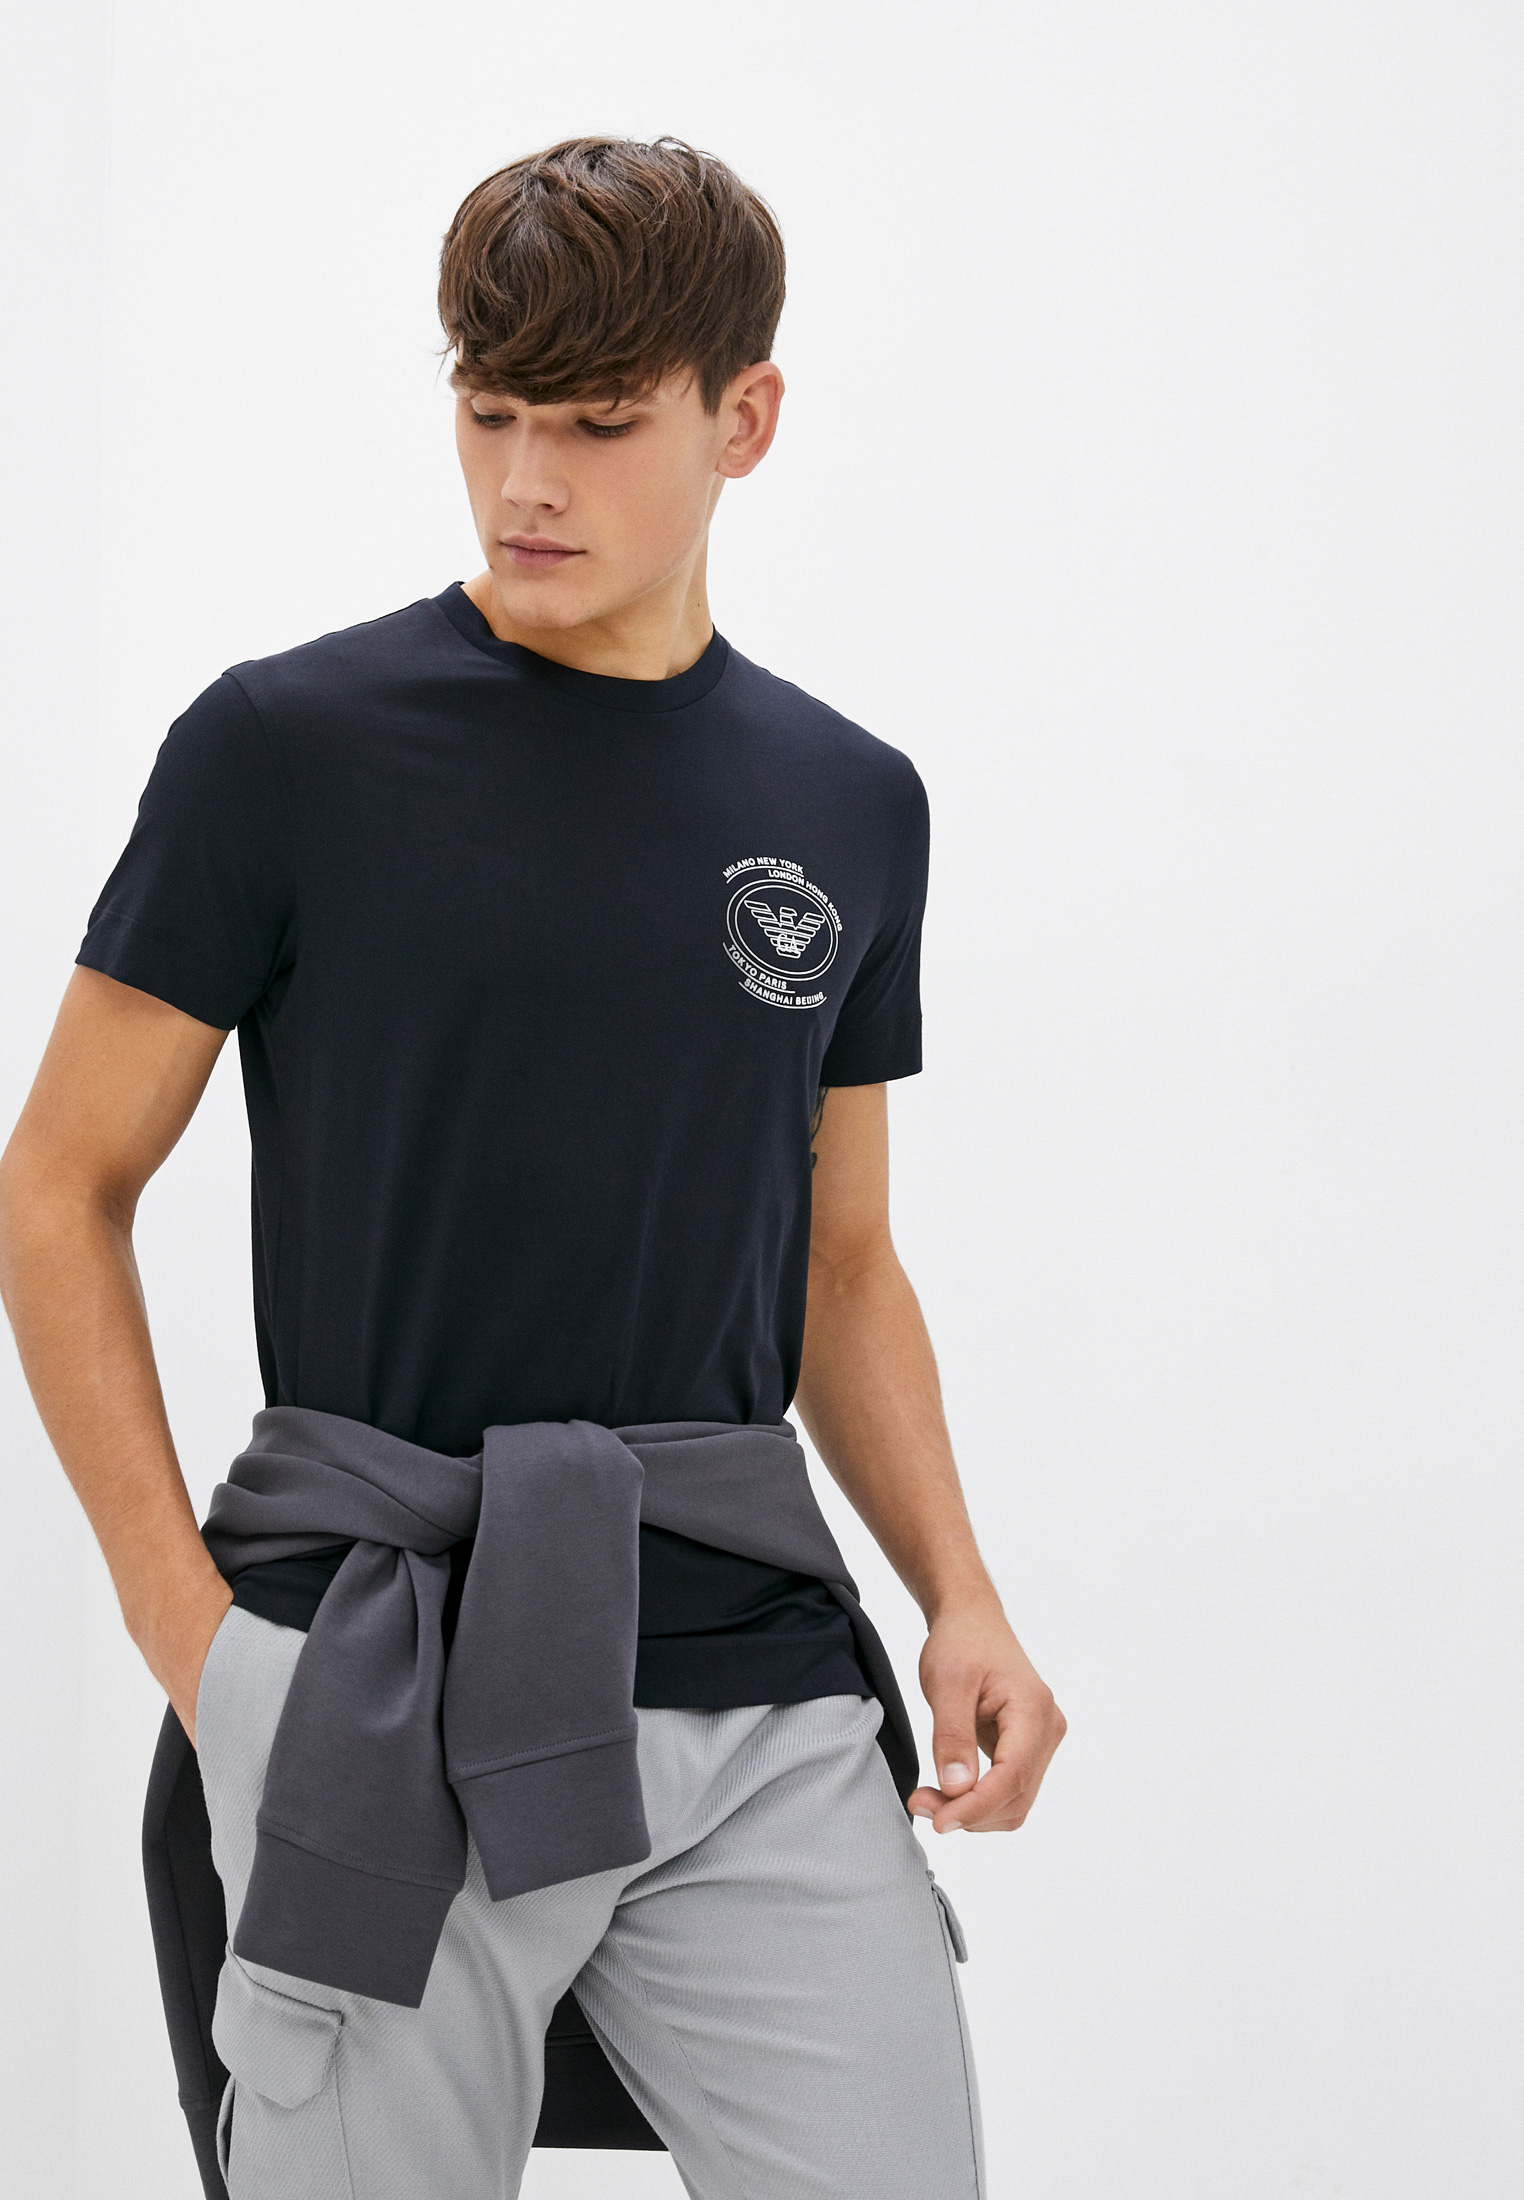 Мужская футболка Emporio Armani (Эмпорио Армани) 6K1T88 1JPZZ